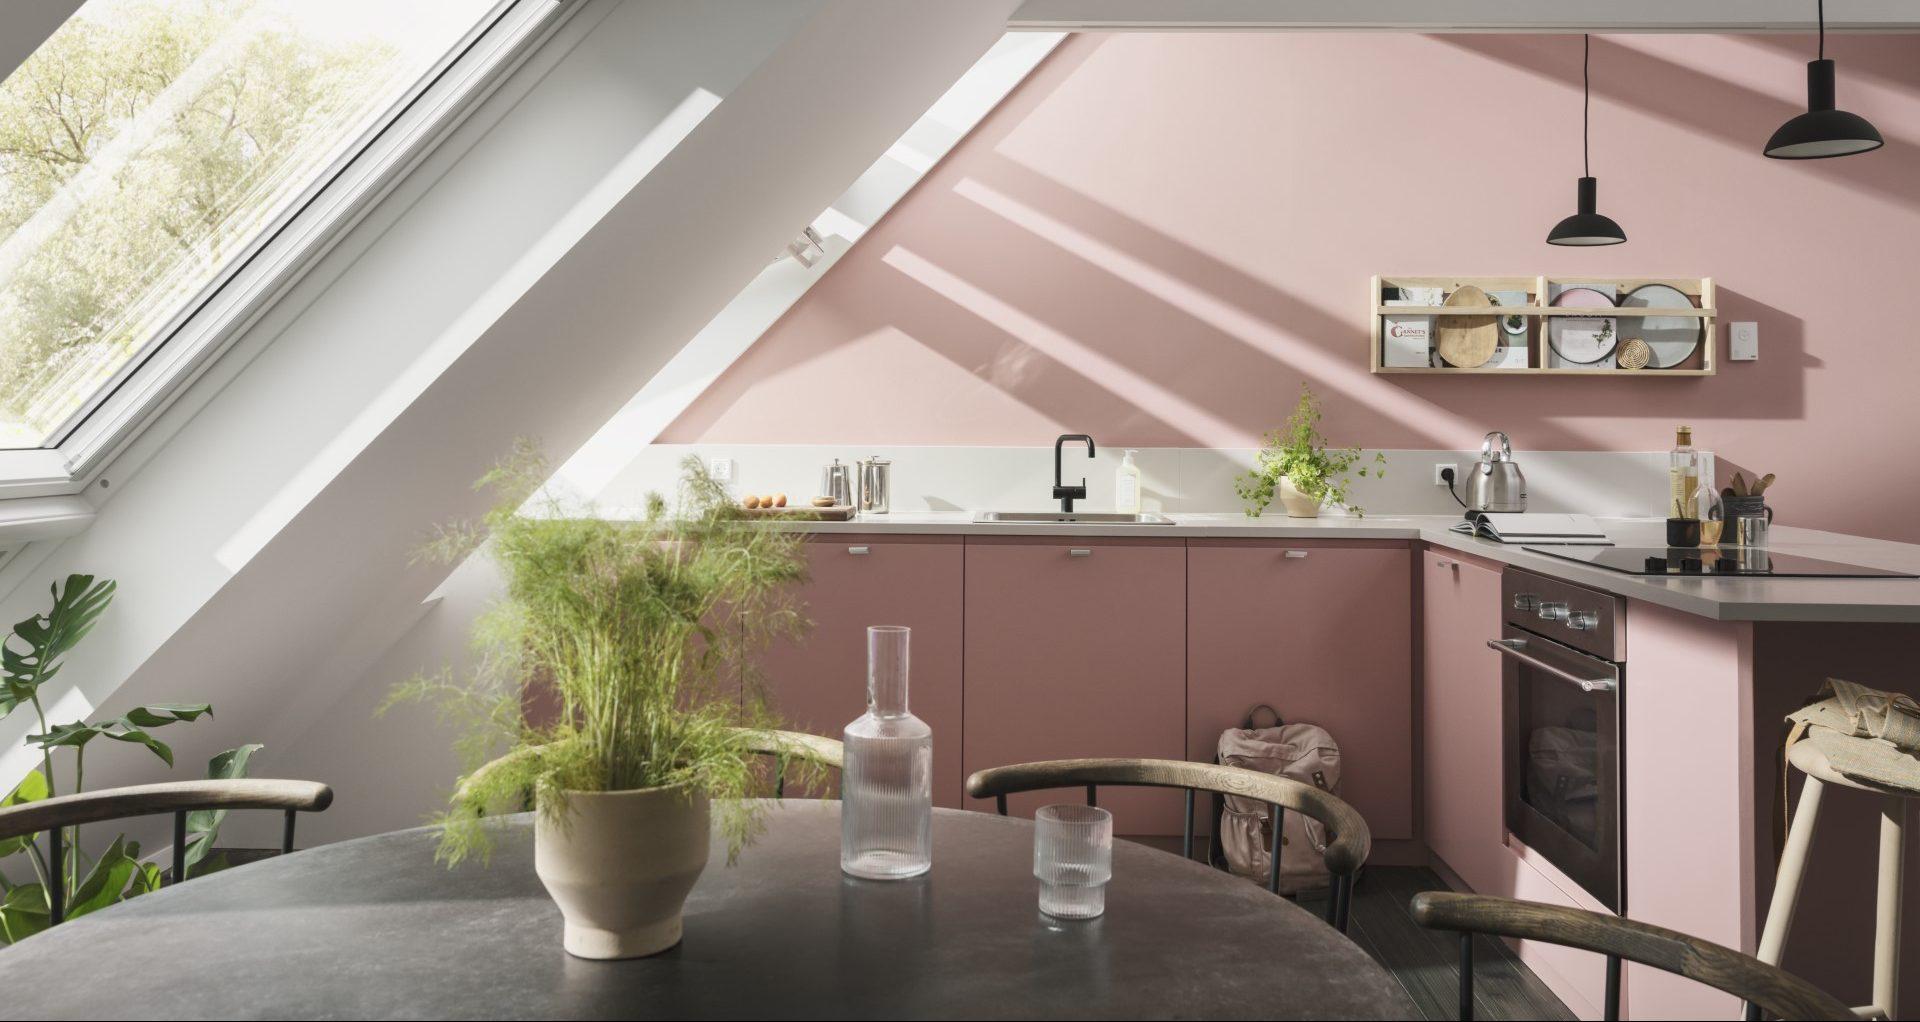 Trasforma la tua cucina in una cucina abitabile mansarda